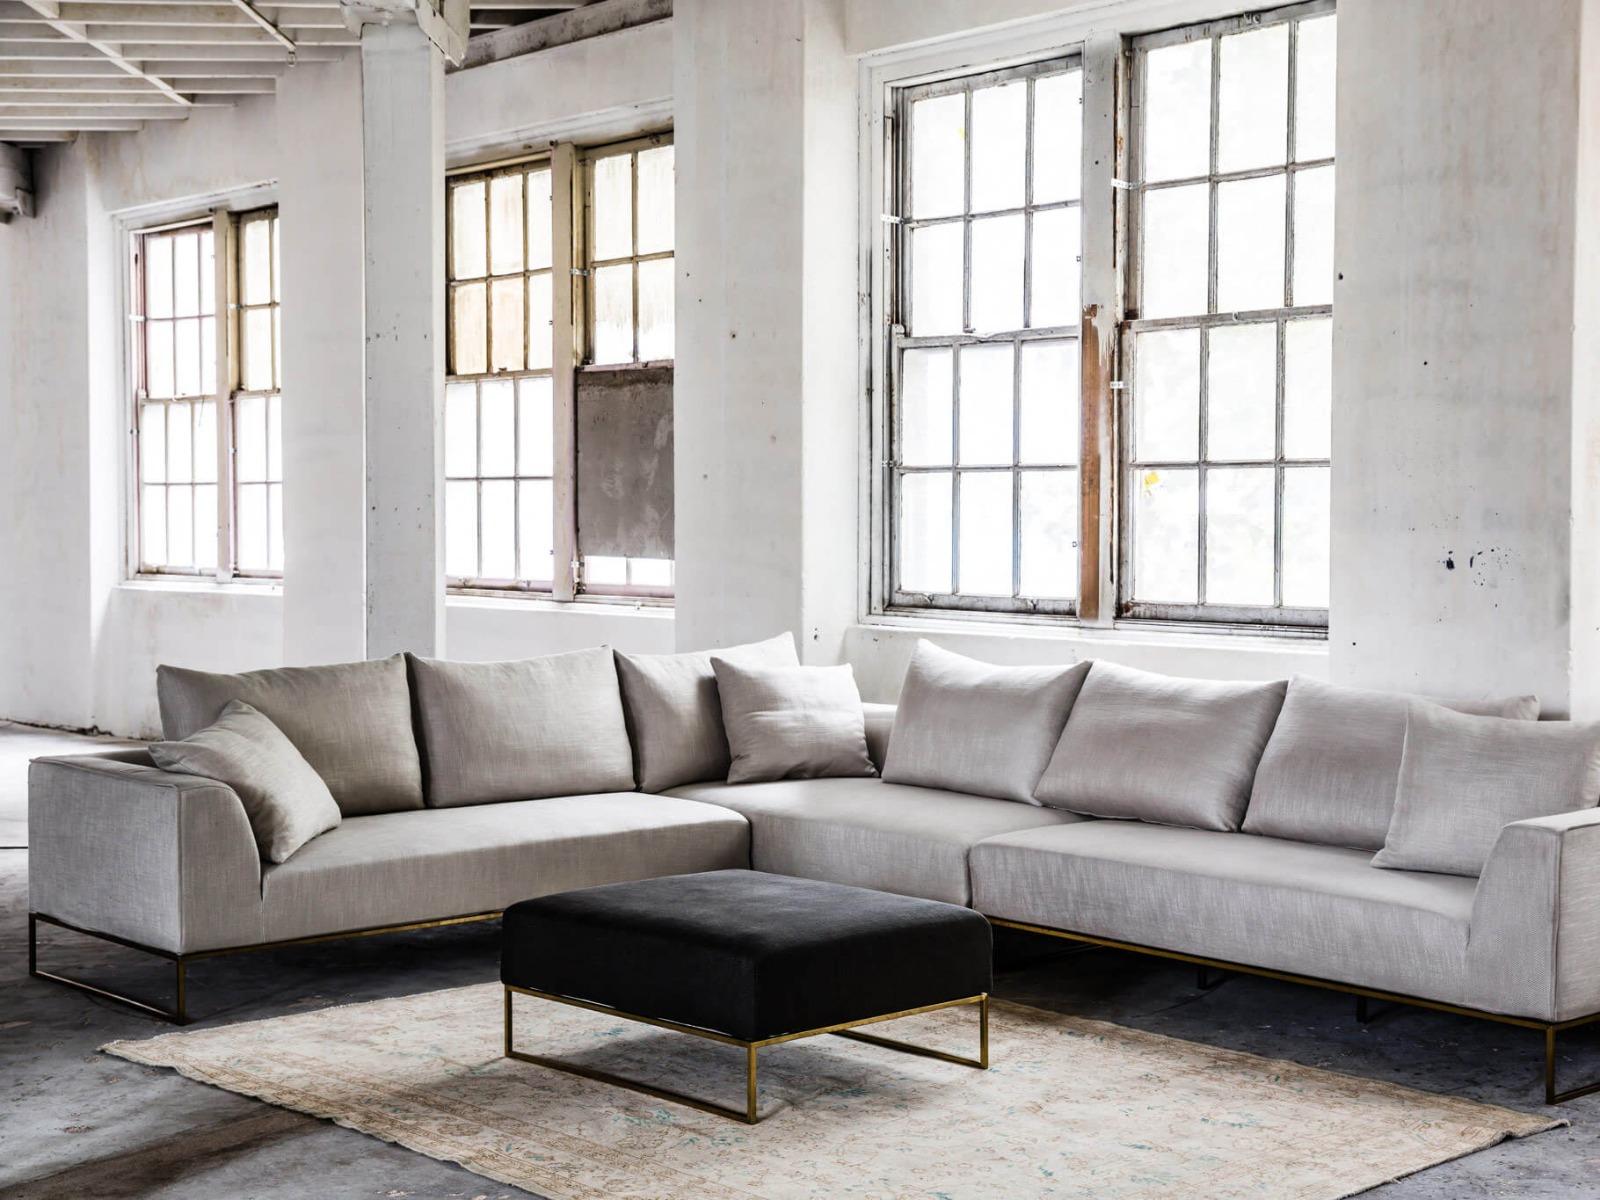 sofa trade in